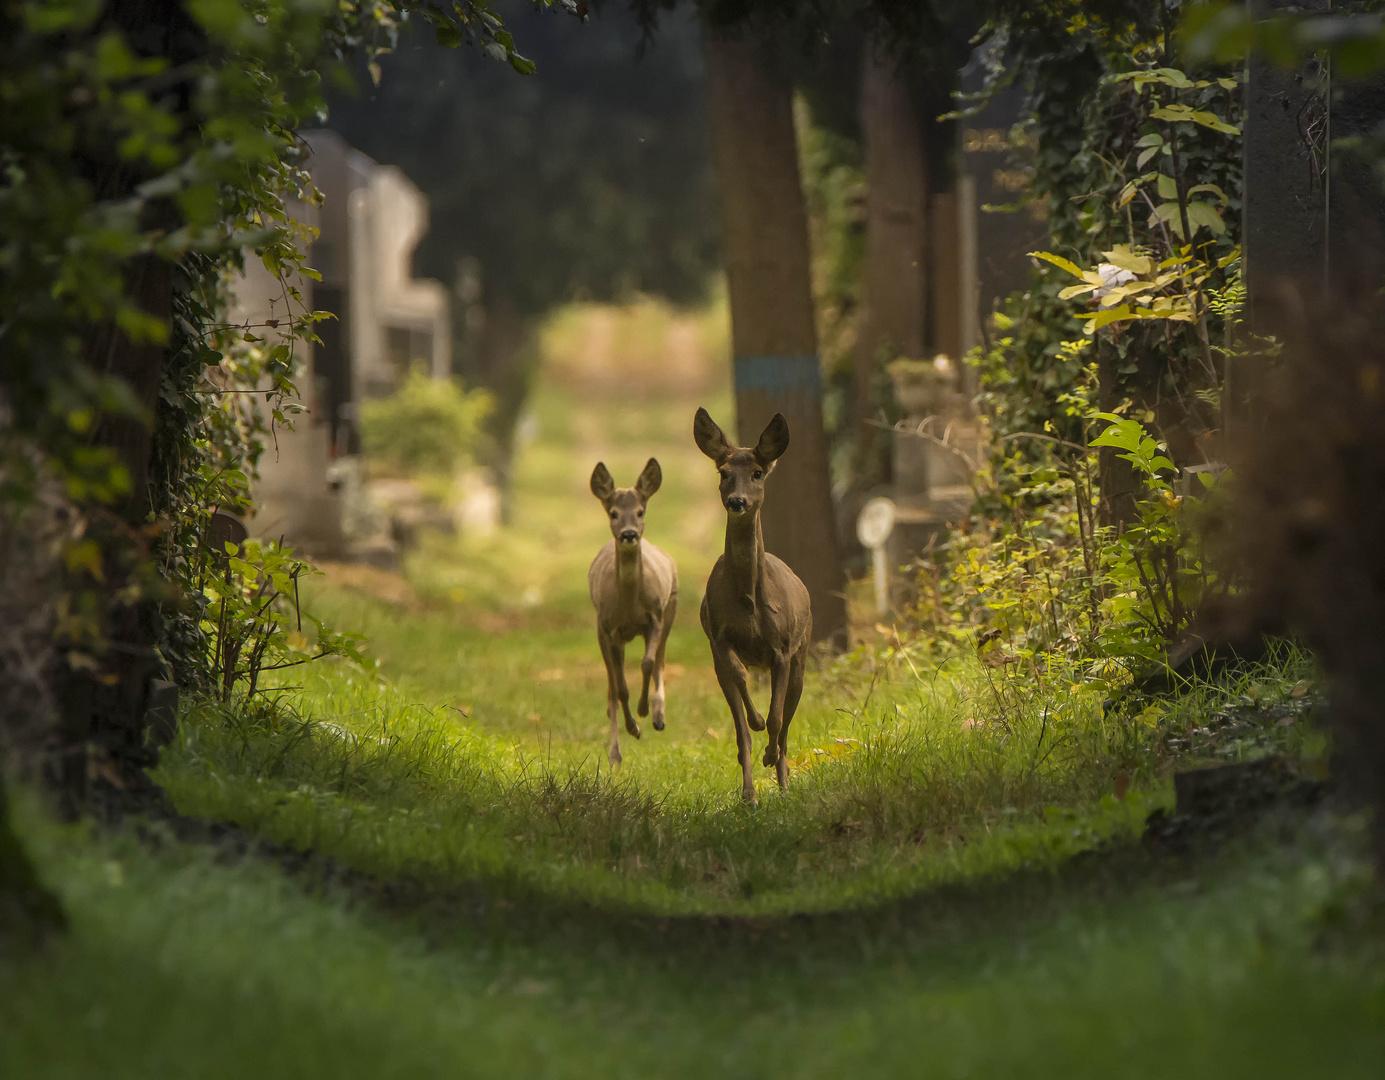 wiens zentralfriedhof ist heimat f r viele tiere foto bild natur landschaft tiere bilder. Black Bedroom Furniture Sets. Home Design Ideas